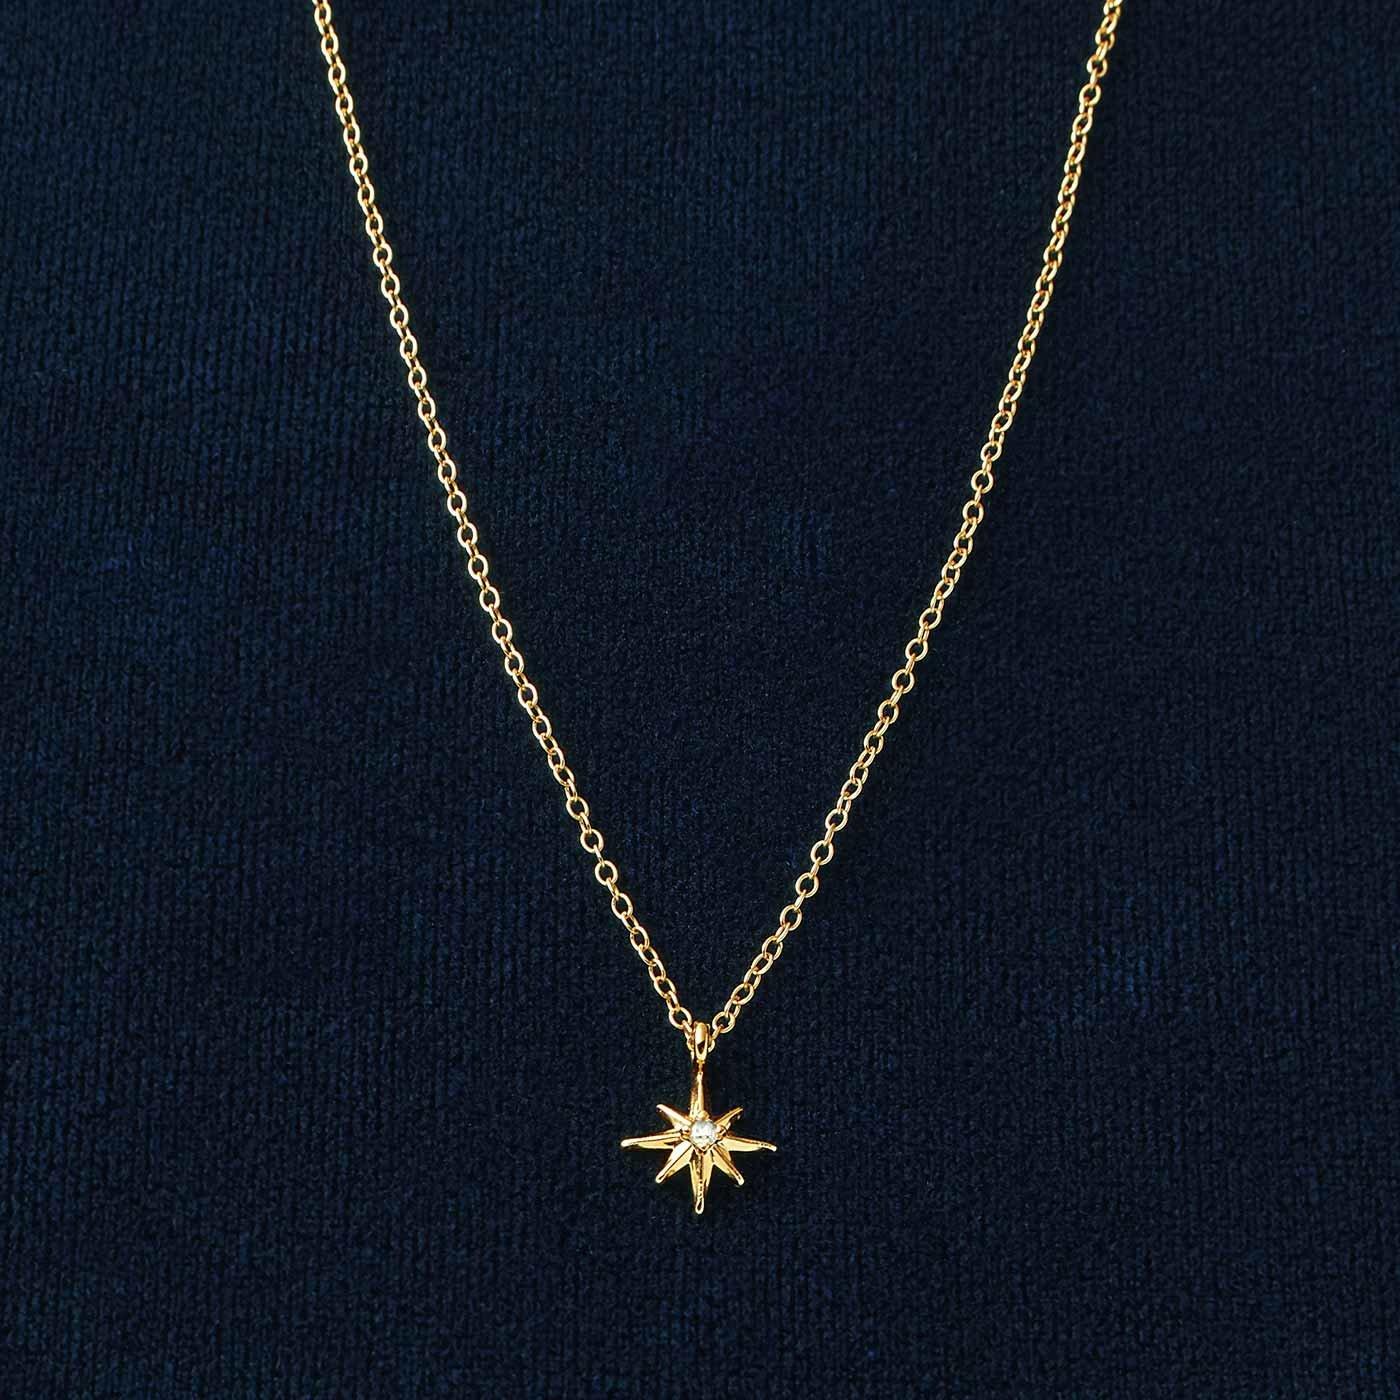 IEDIT[イディット] スターモチーフ一粒ダイアモンドネックレス〈ゴールド〉